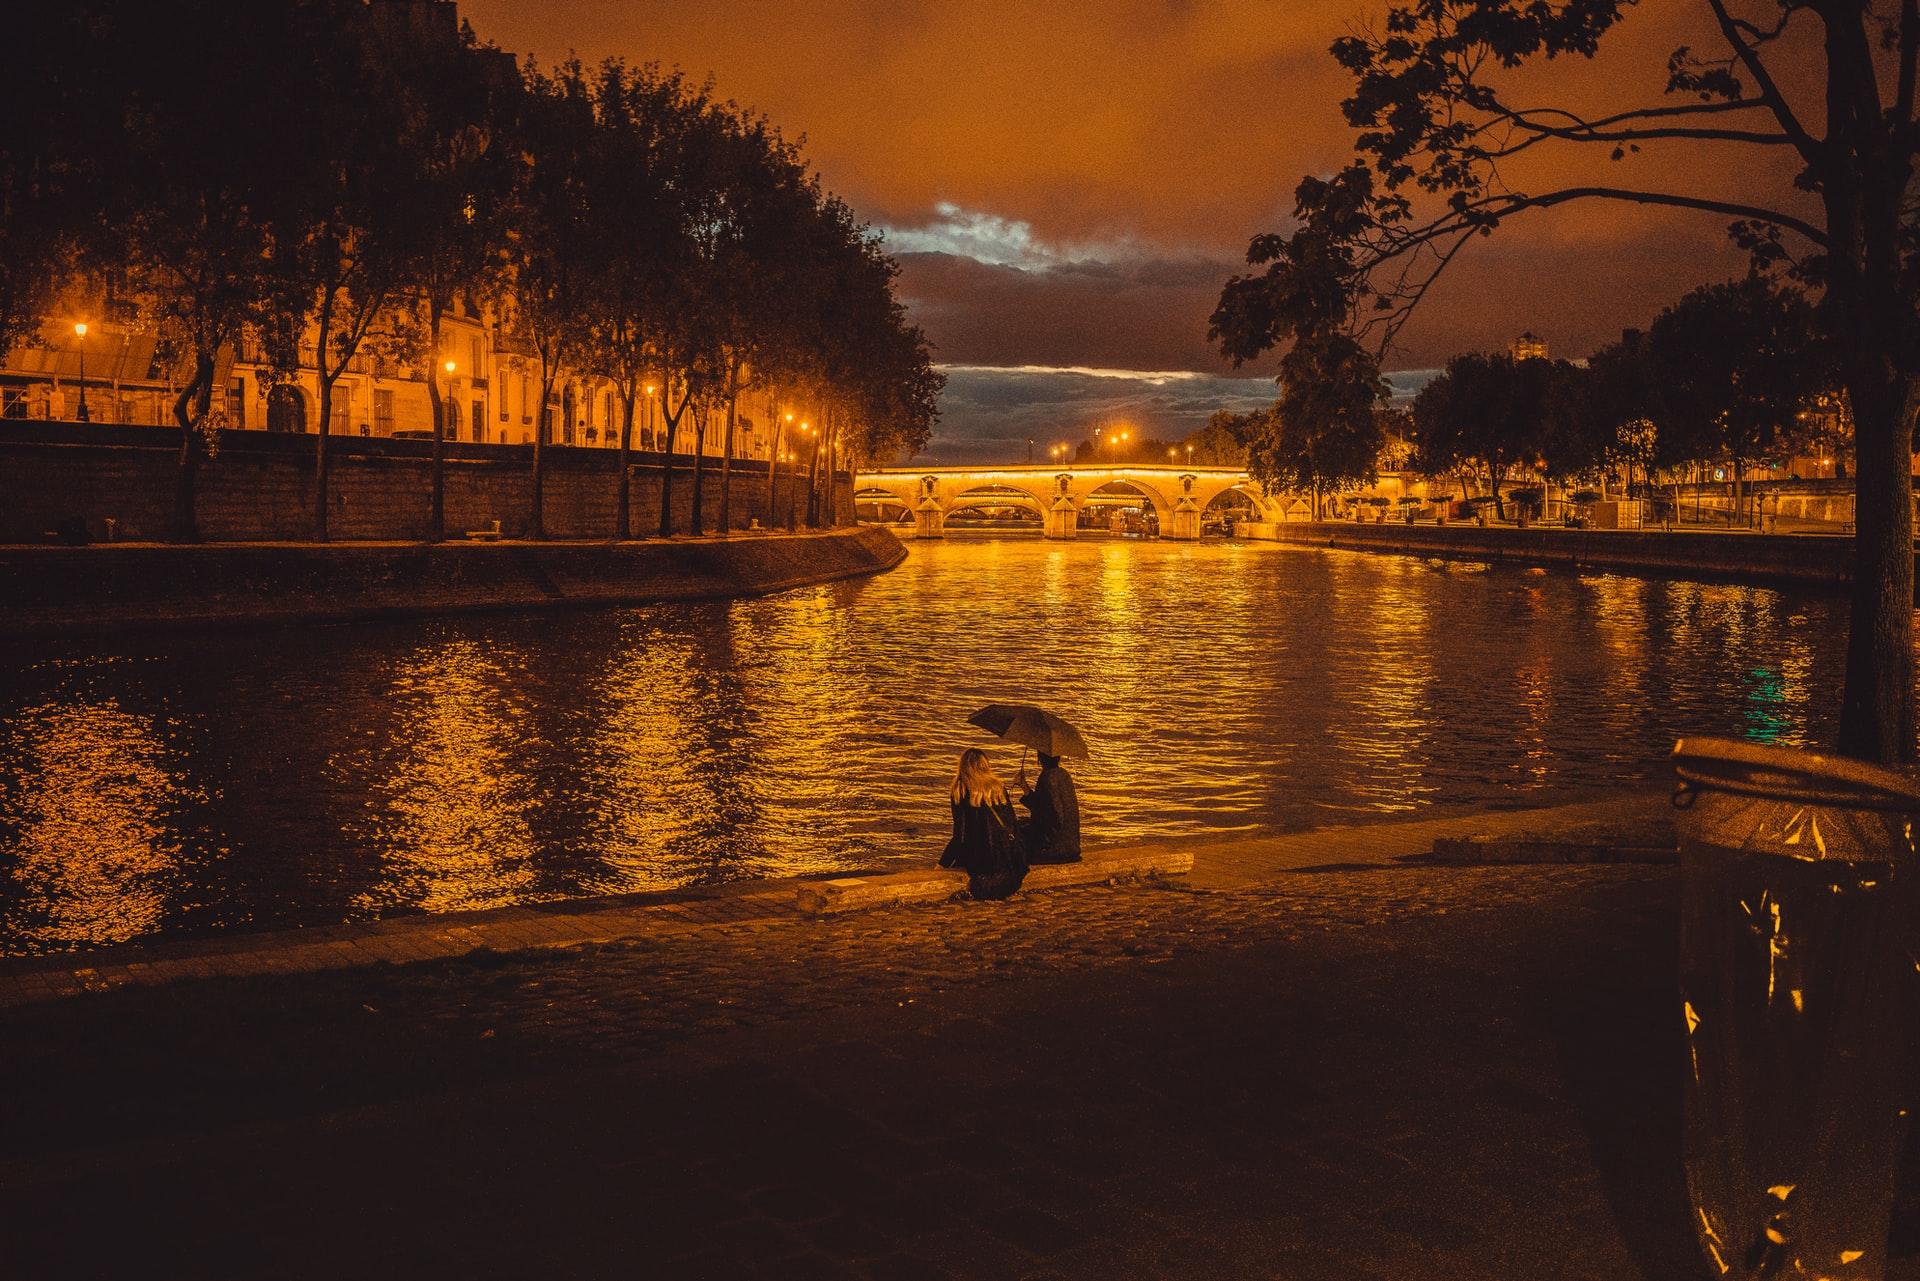 Seine River after sunset